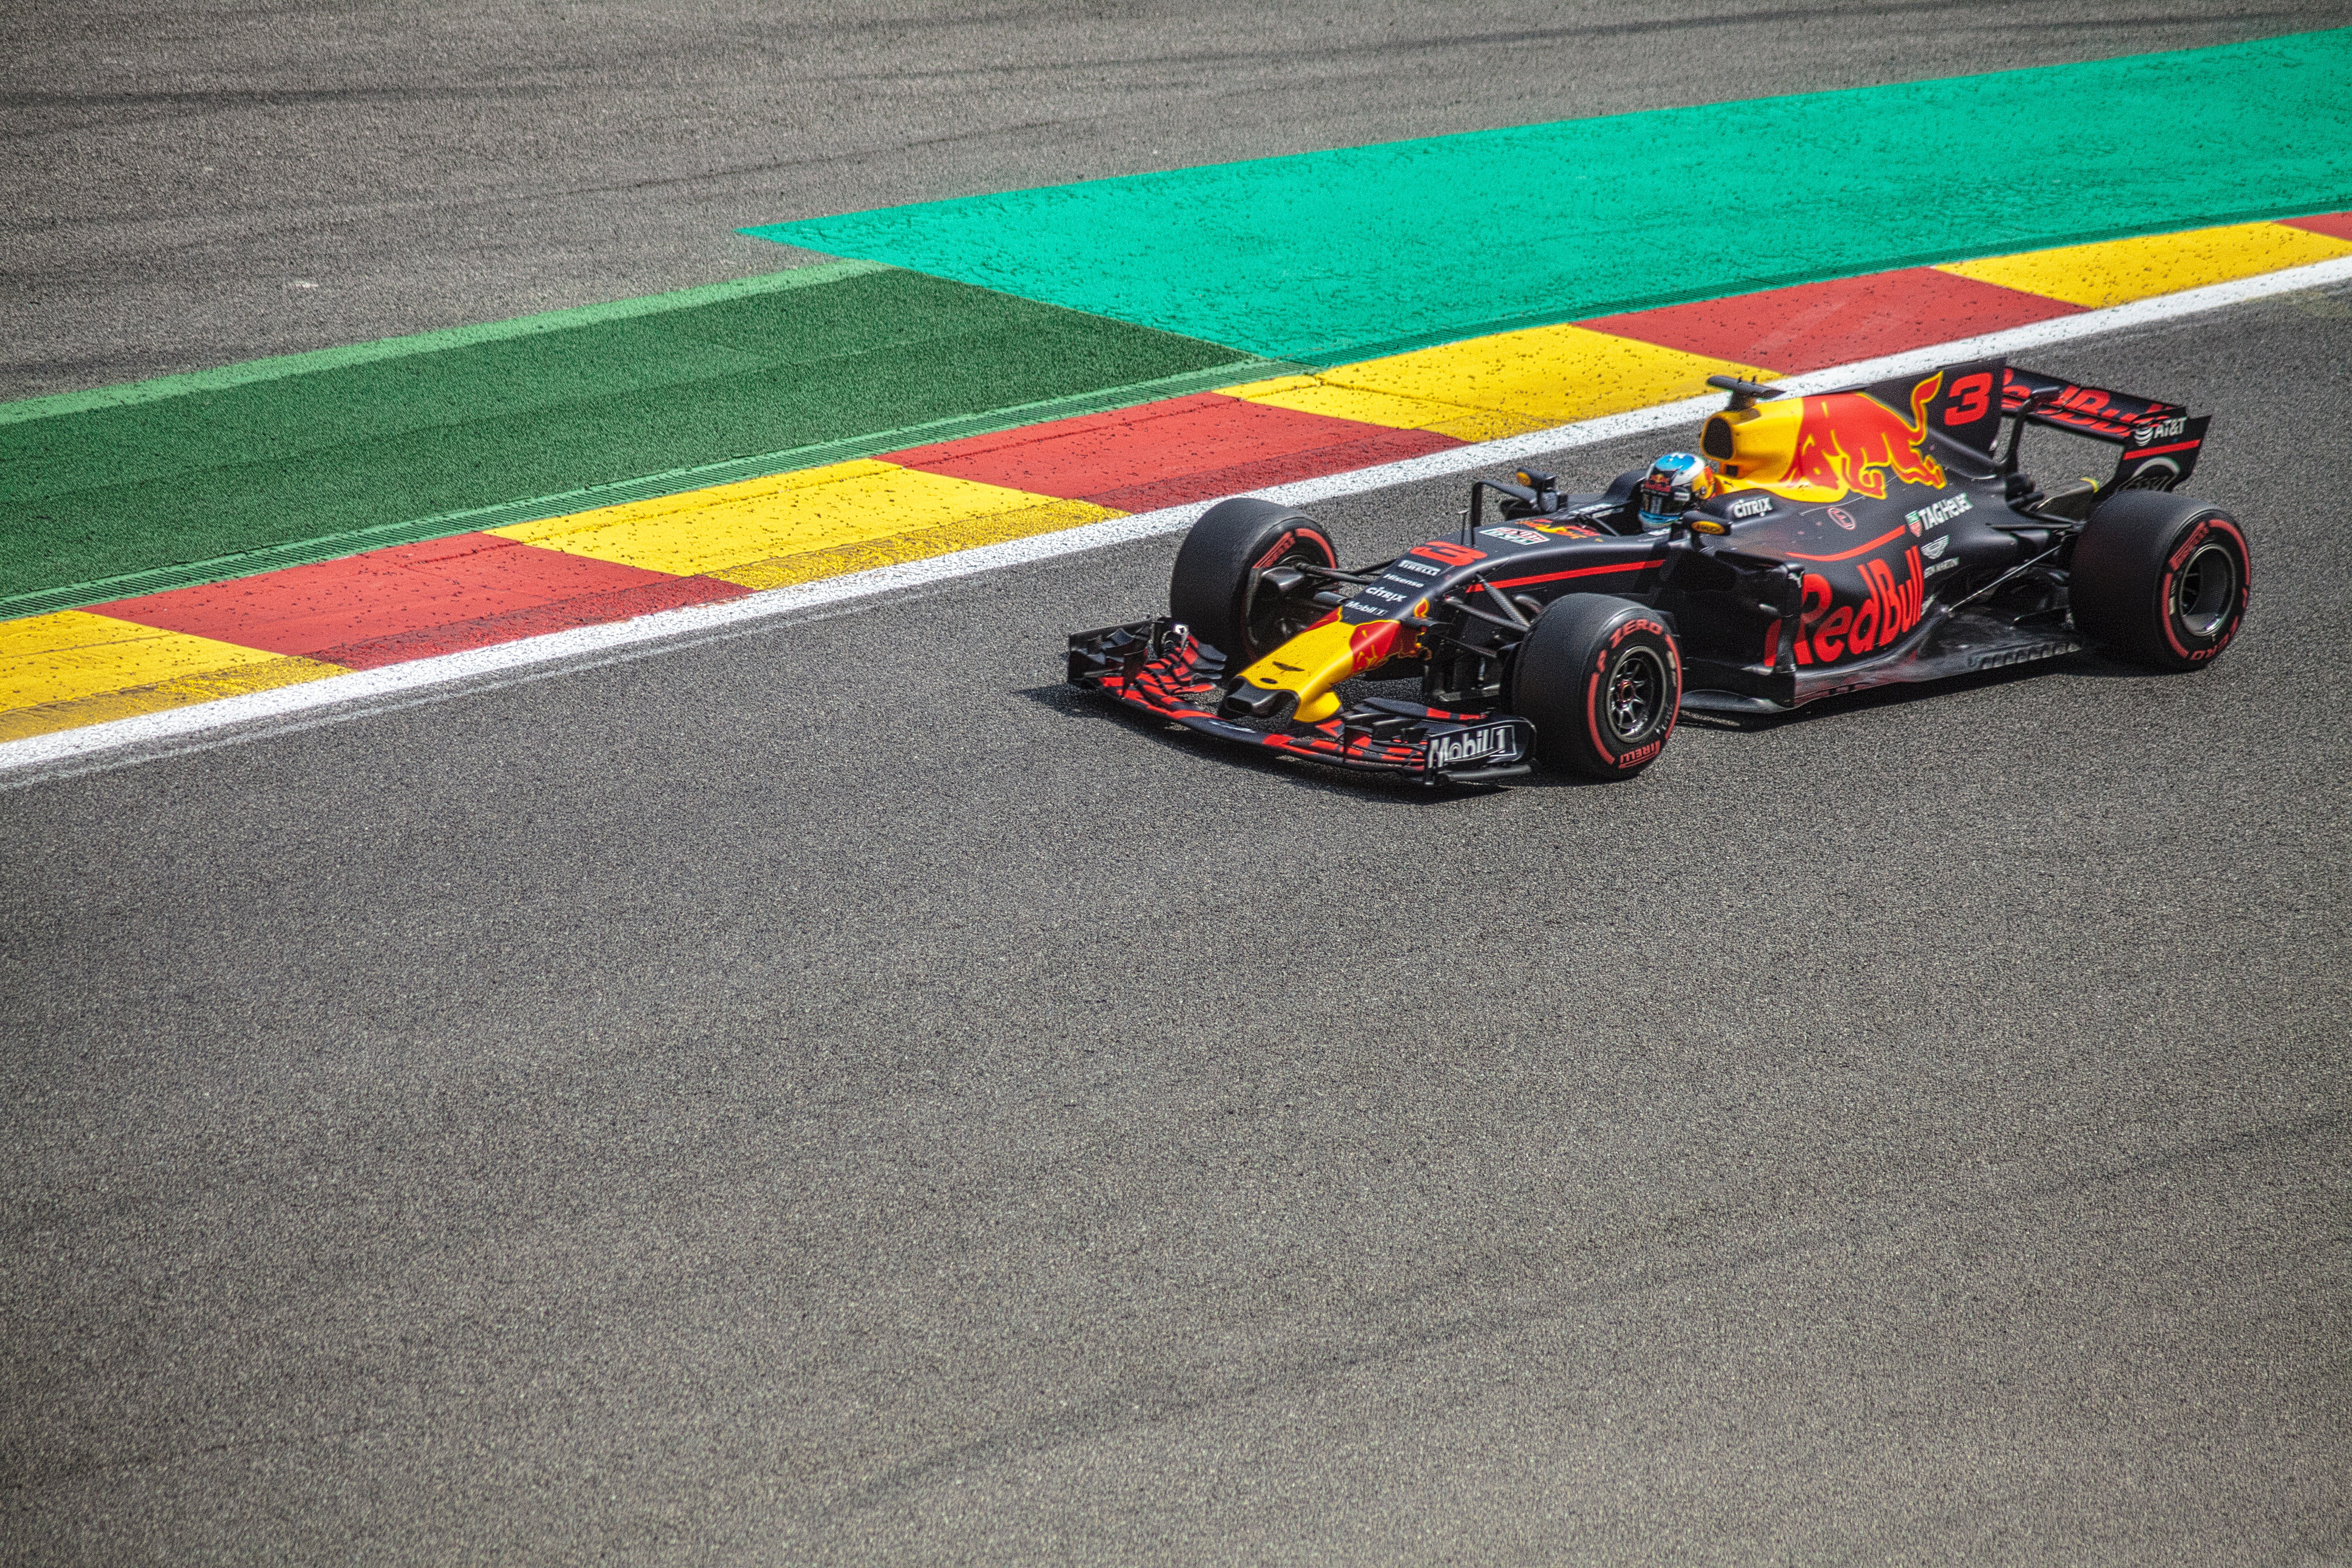 A formula one race car on a race track